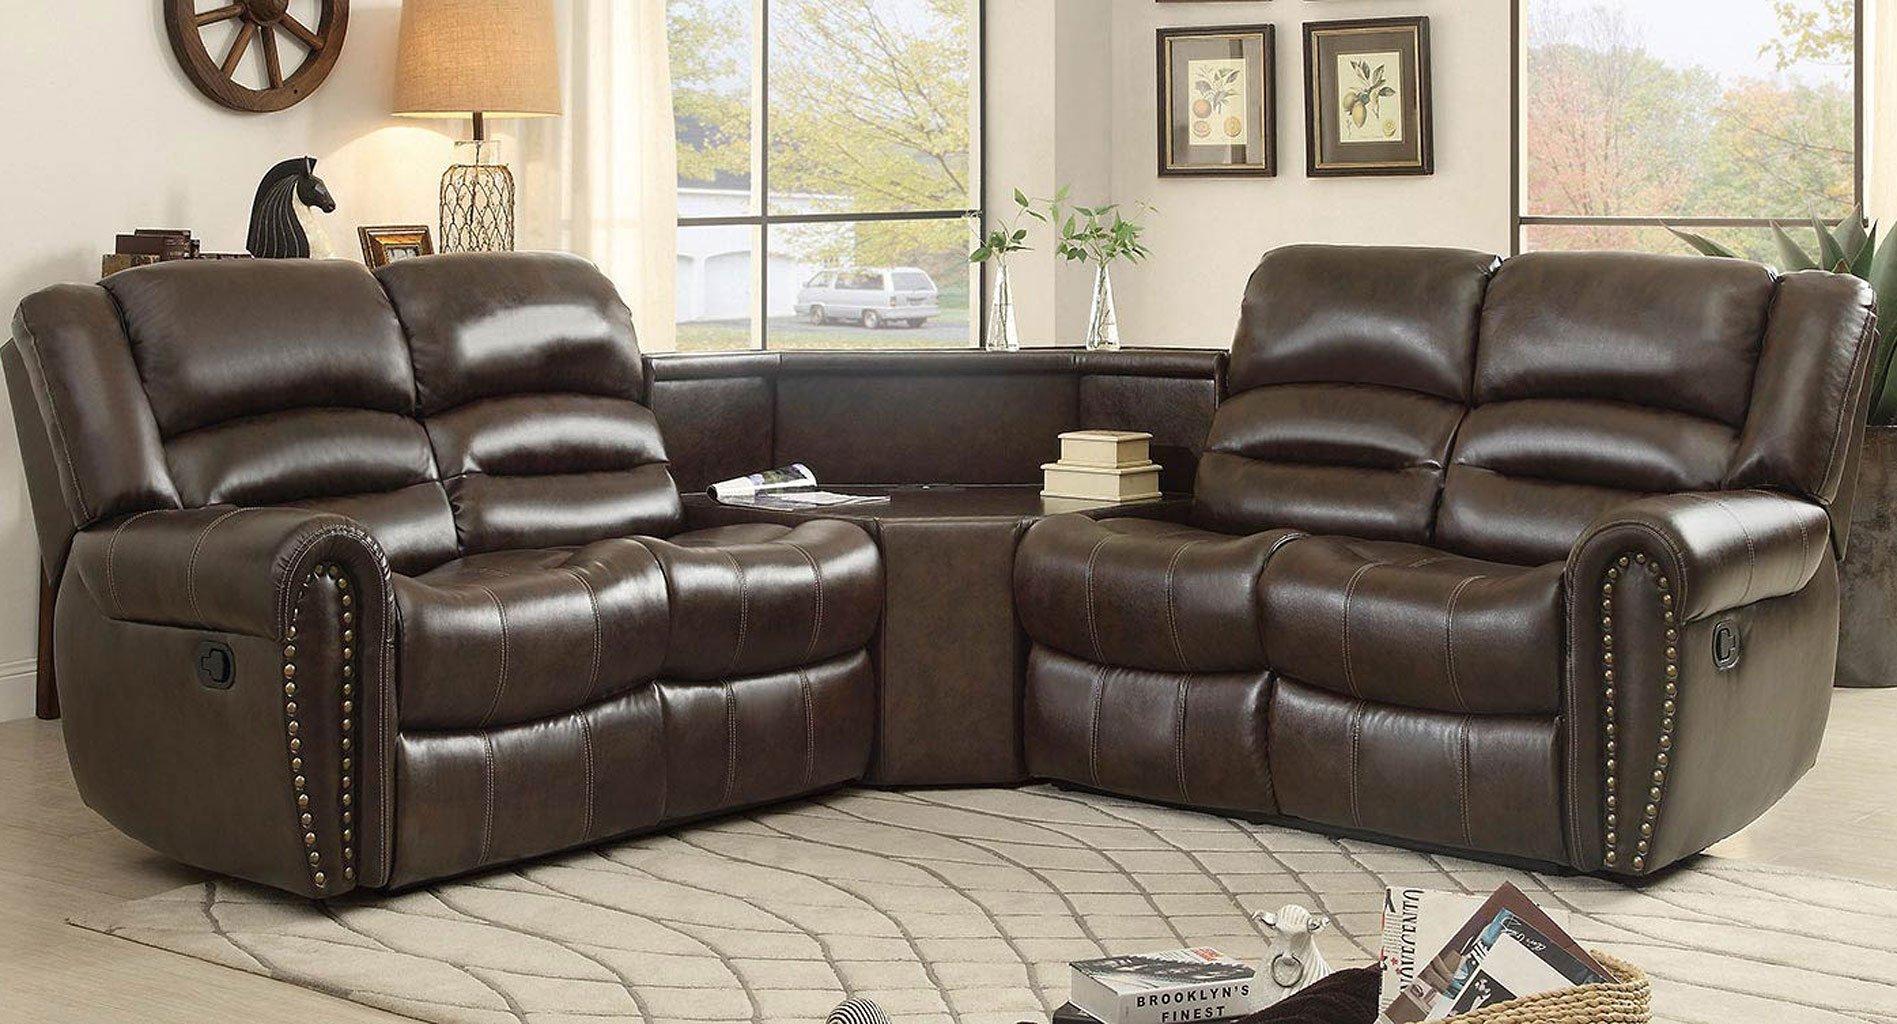 Palmyra modular reclining sectional w table wedge Living room furniture reclining sofa